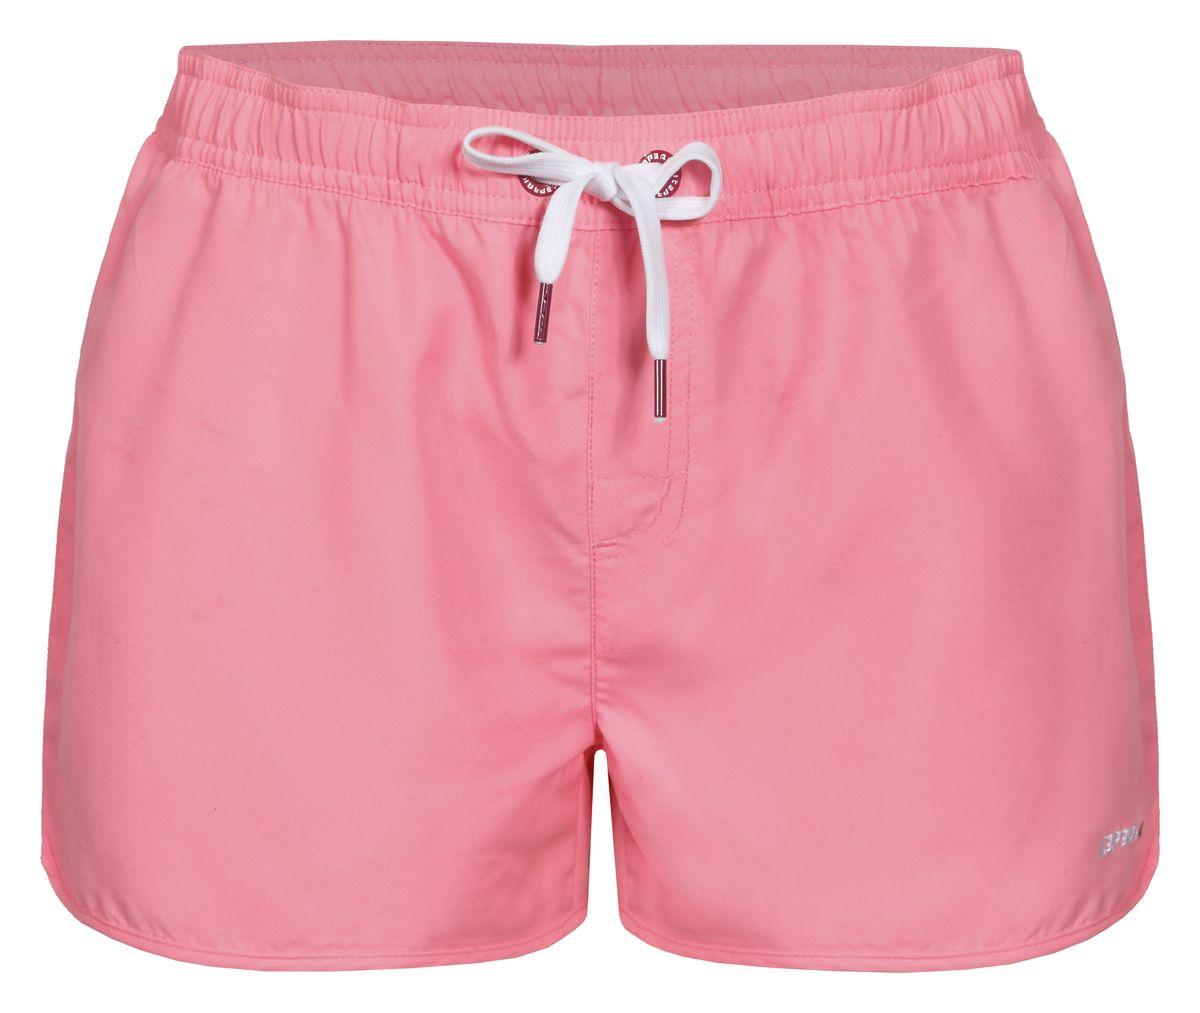 Шорты для плавания женские Icepeak Kristin, цвет: розовый. 754524513IV. Размер 36 (42)